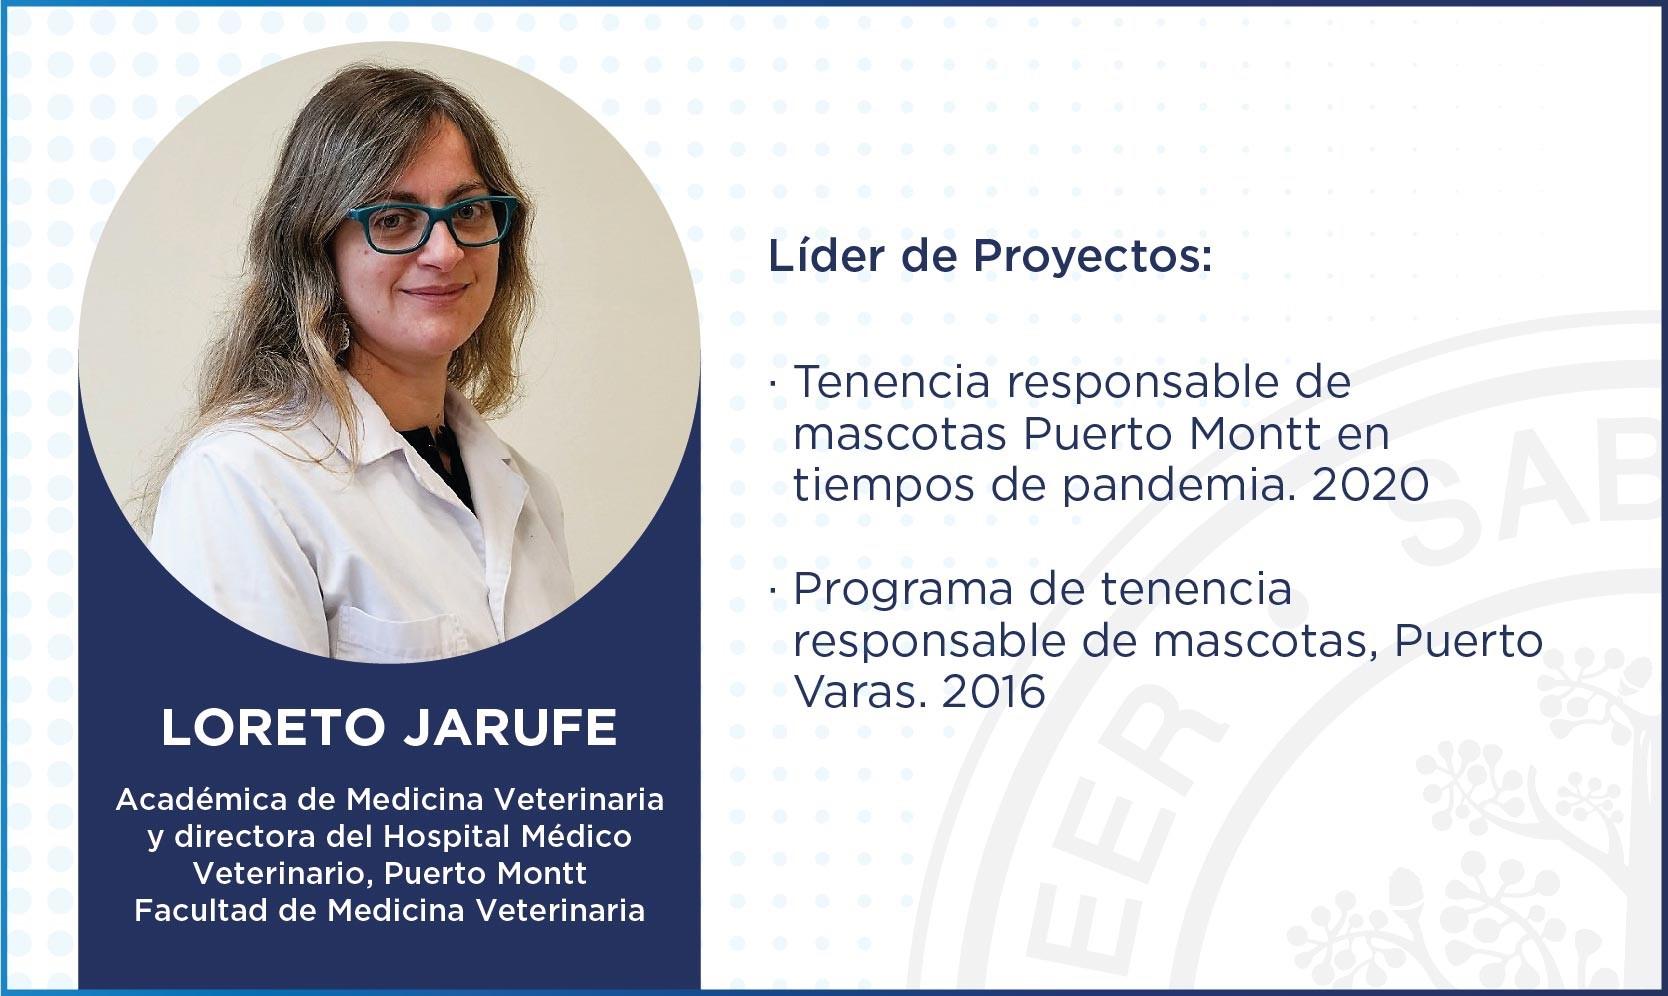 loreto-jarufe2